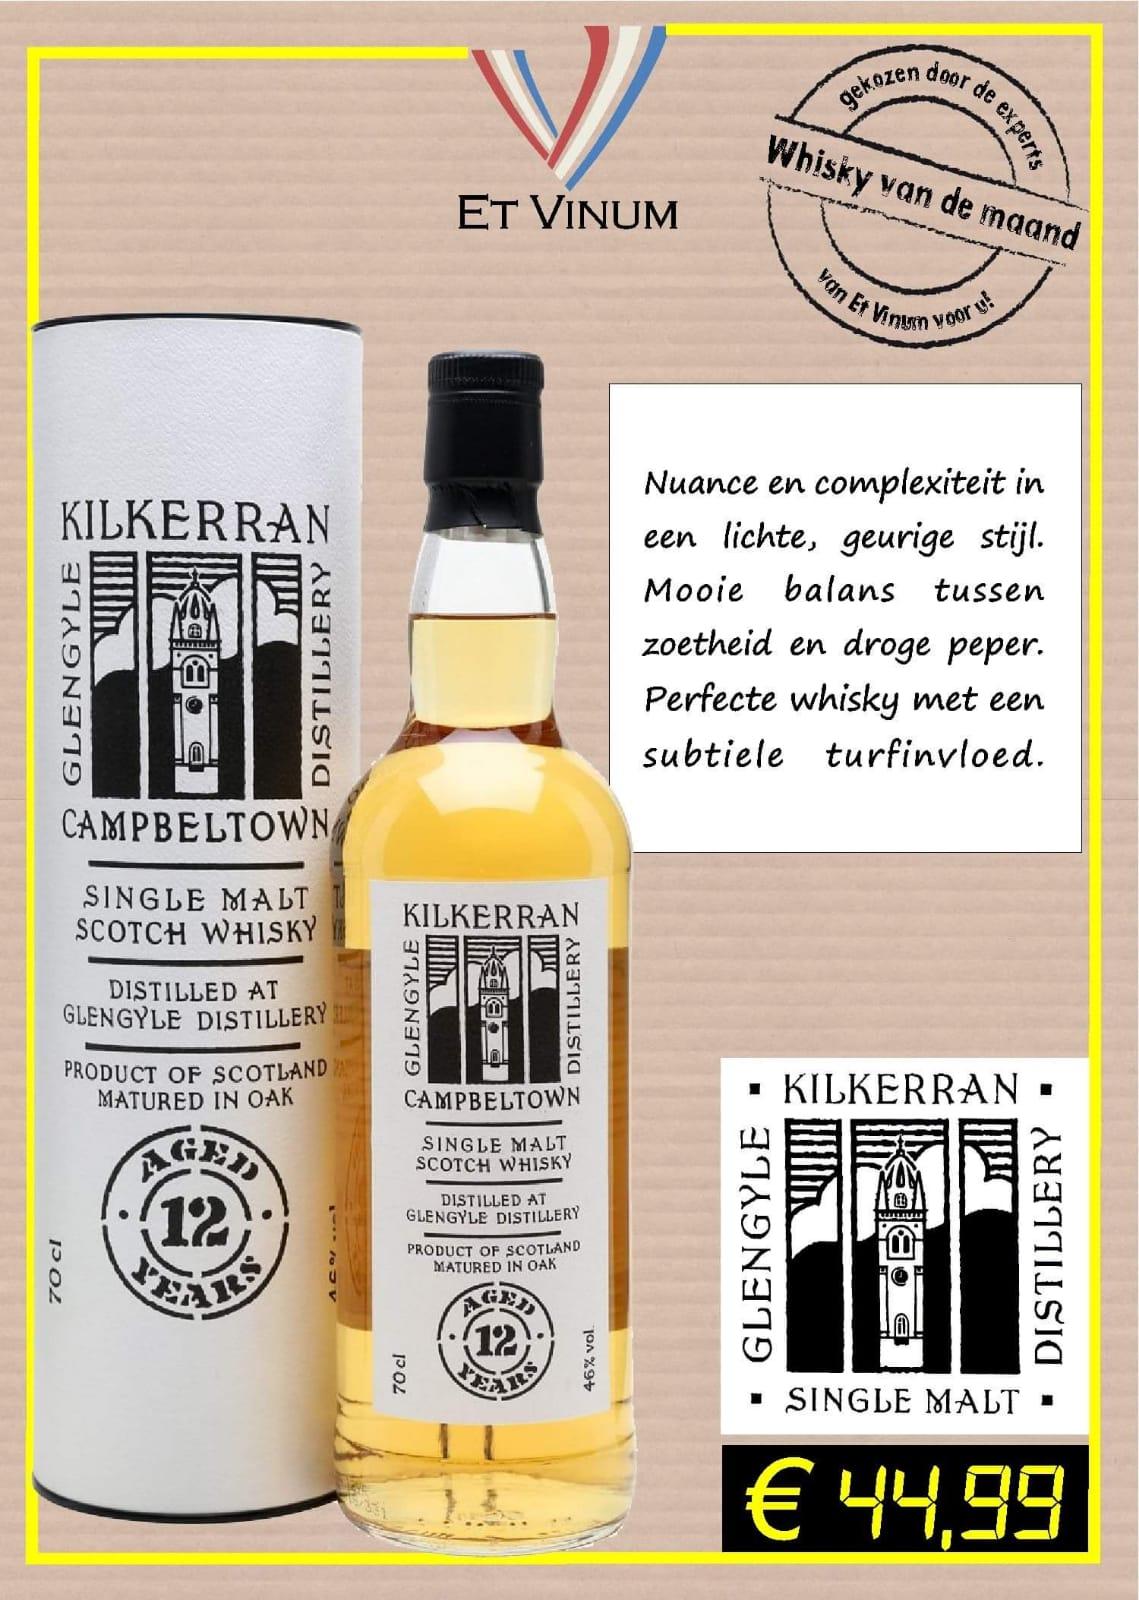 http://zonneveld1966.eu/wp-content/uploads/2019/04/whisky_mei_19.jpg